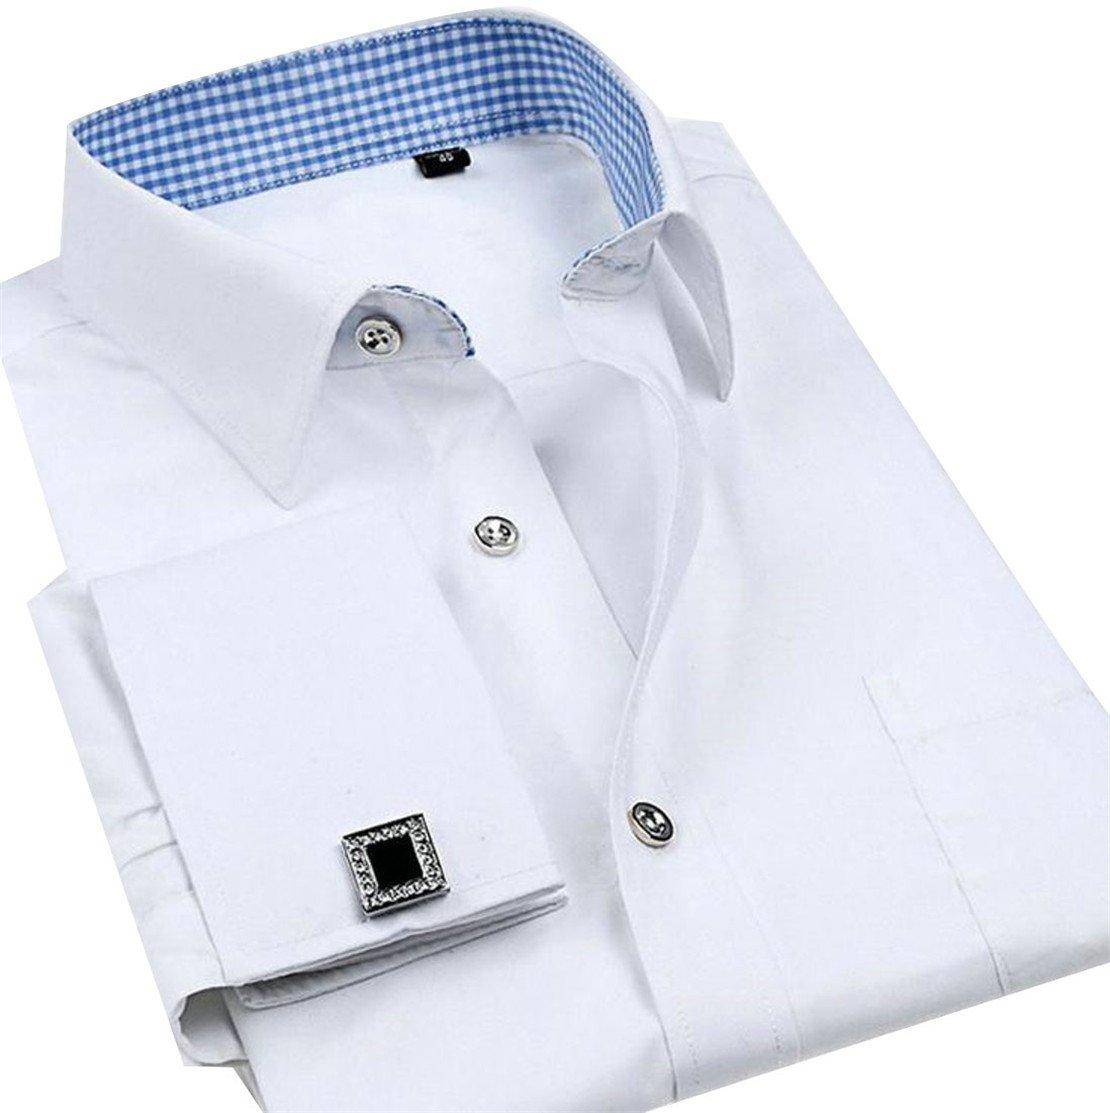 Pandapang Mens Vogue Pocket Long Sleeve Lapel Neck Cufflinks Button Down Shirts White L